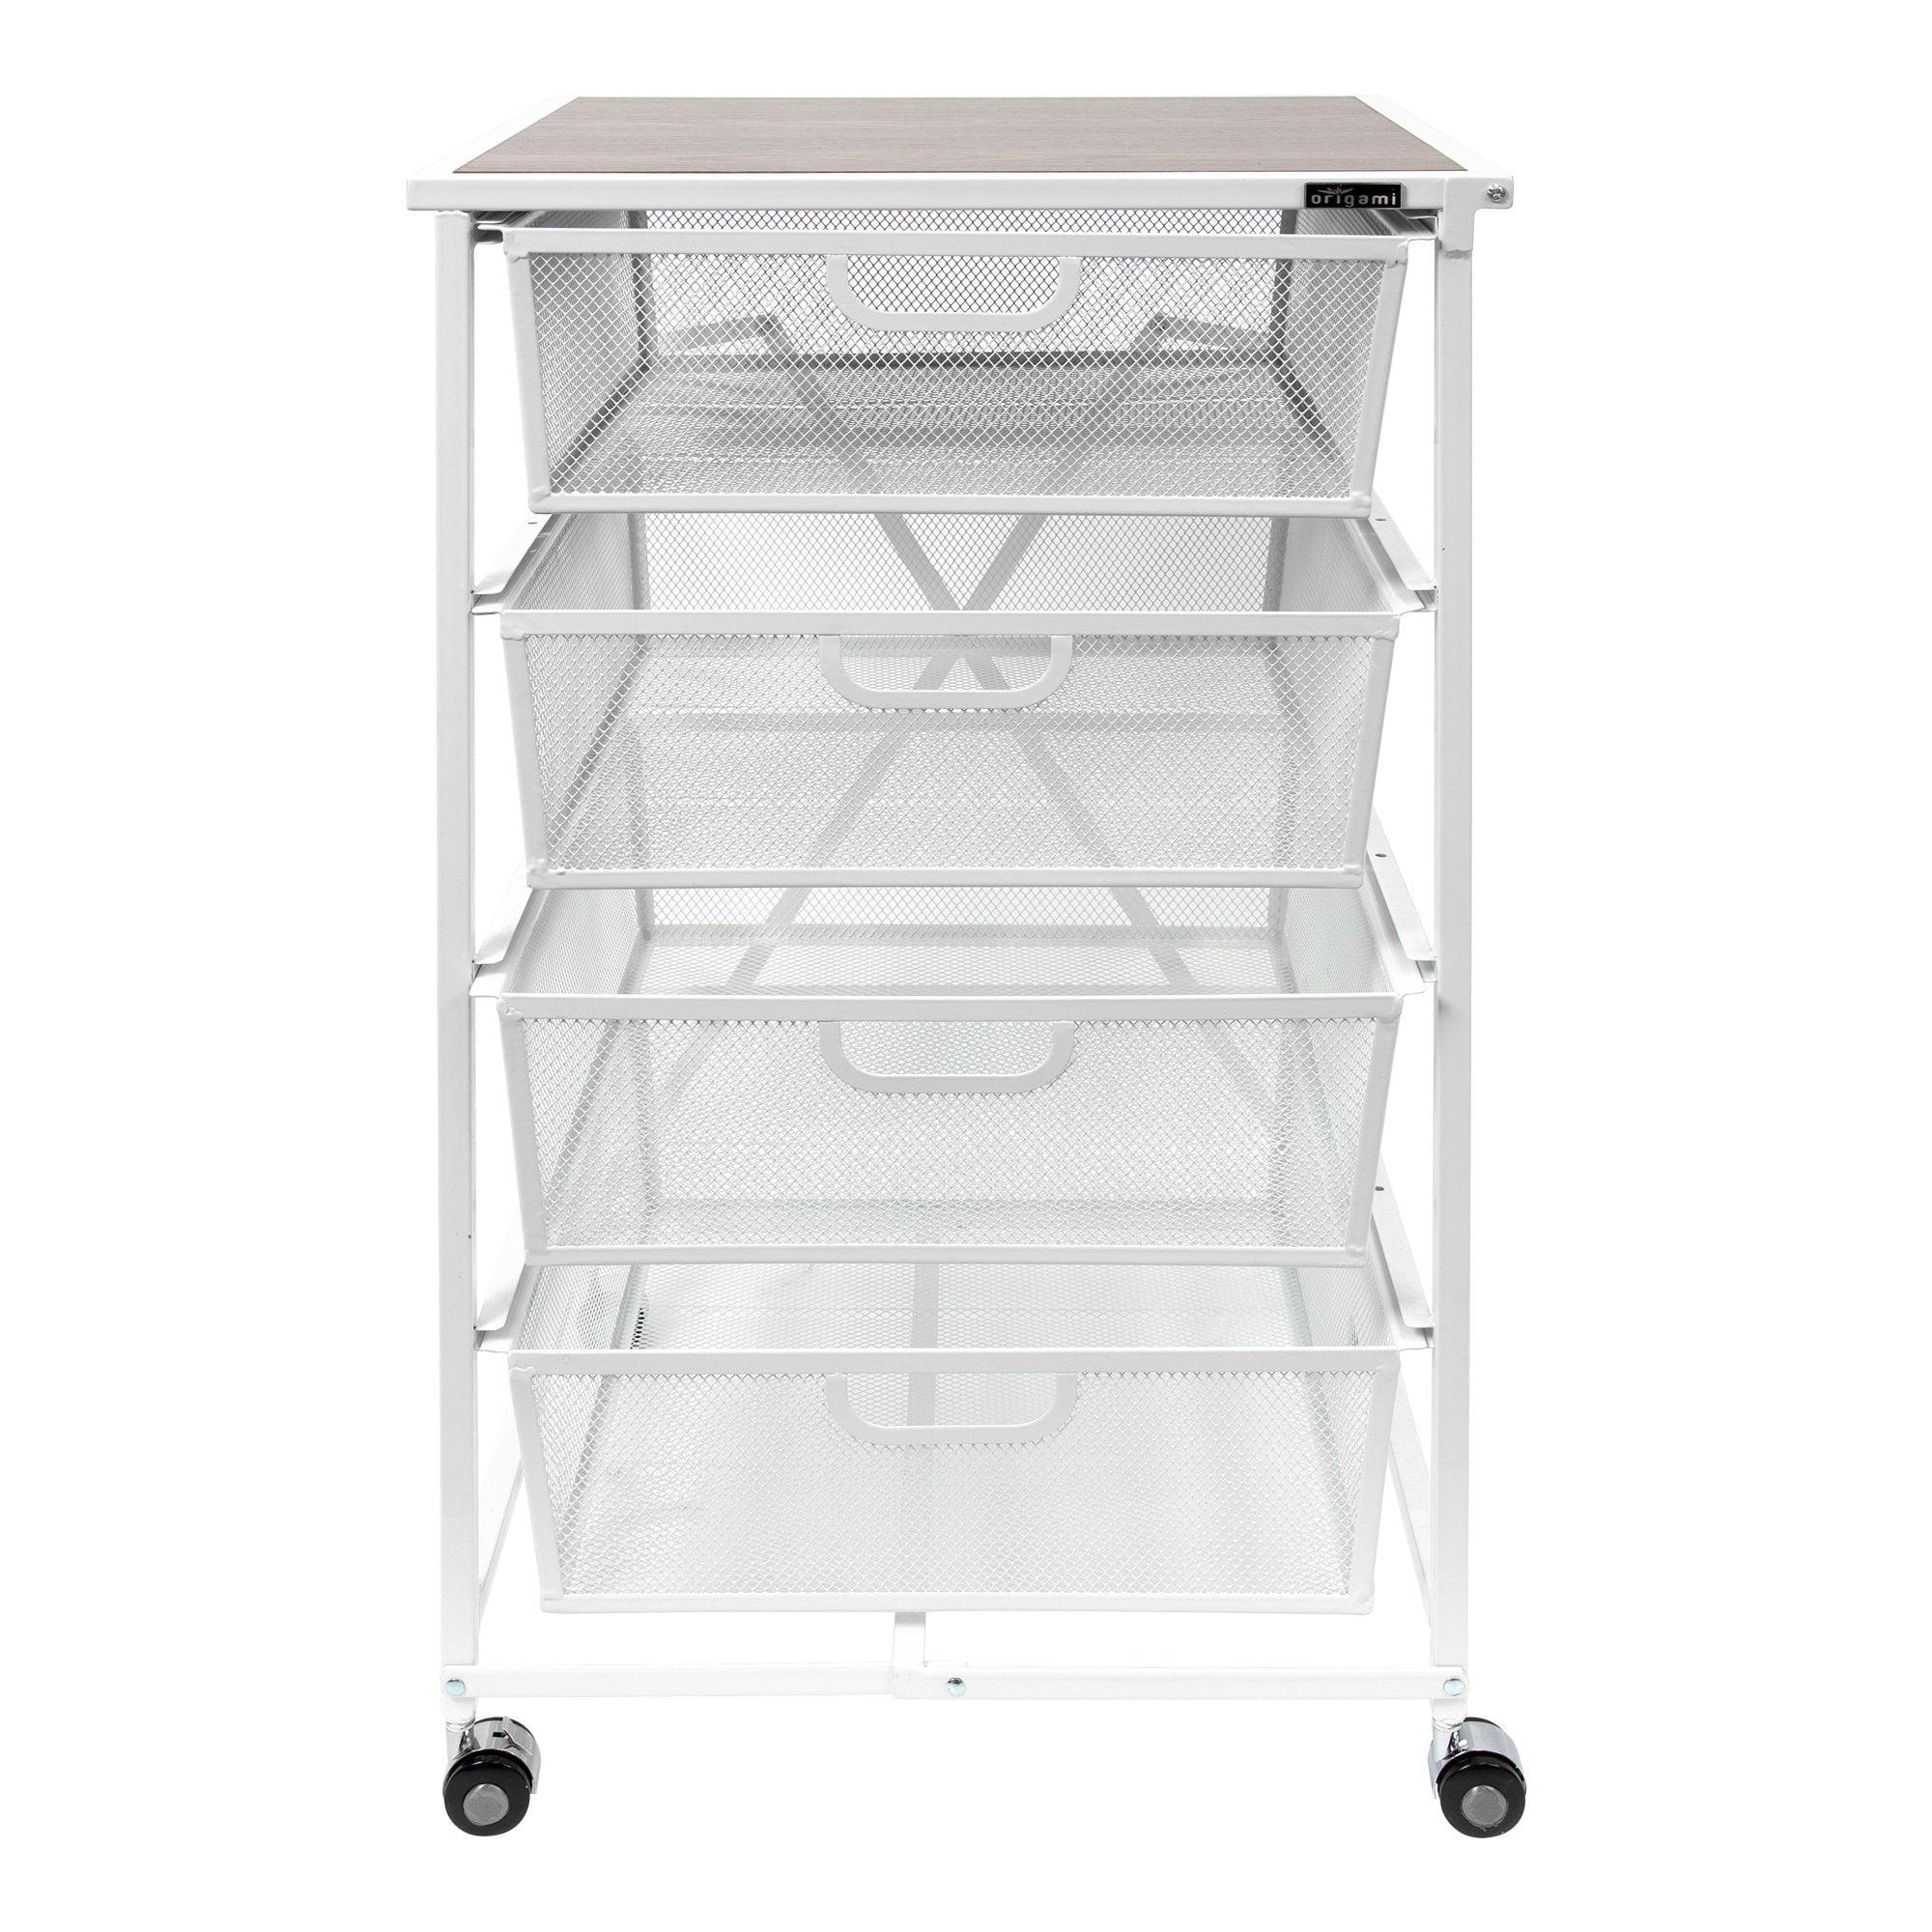 OrigamiRack 4-Drawer Storage Cart